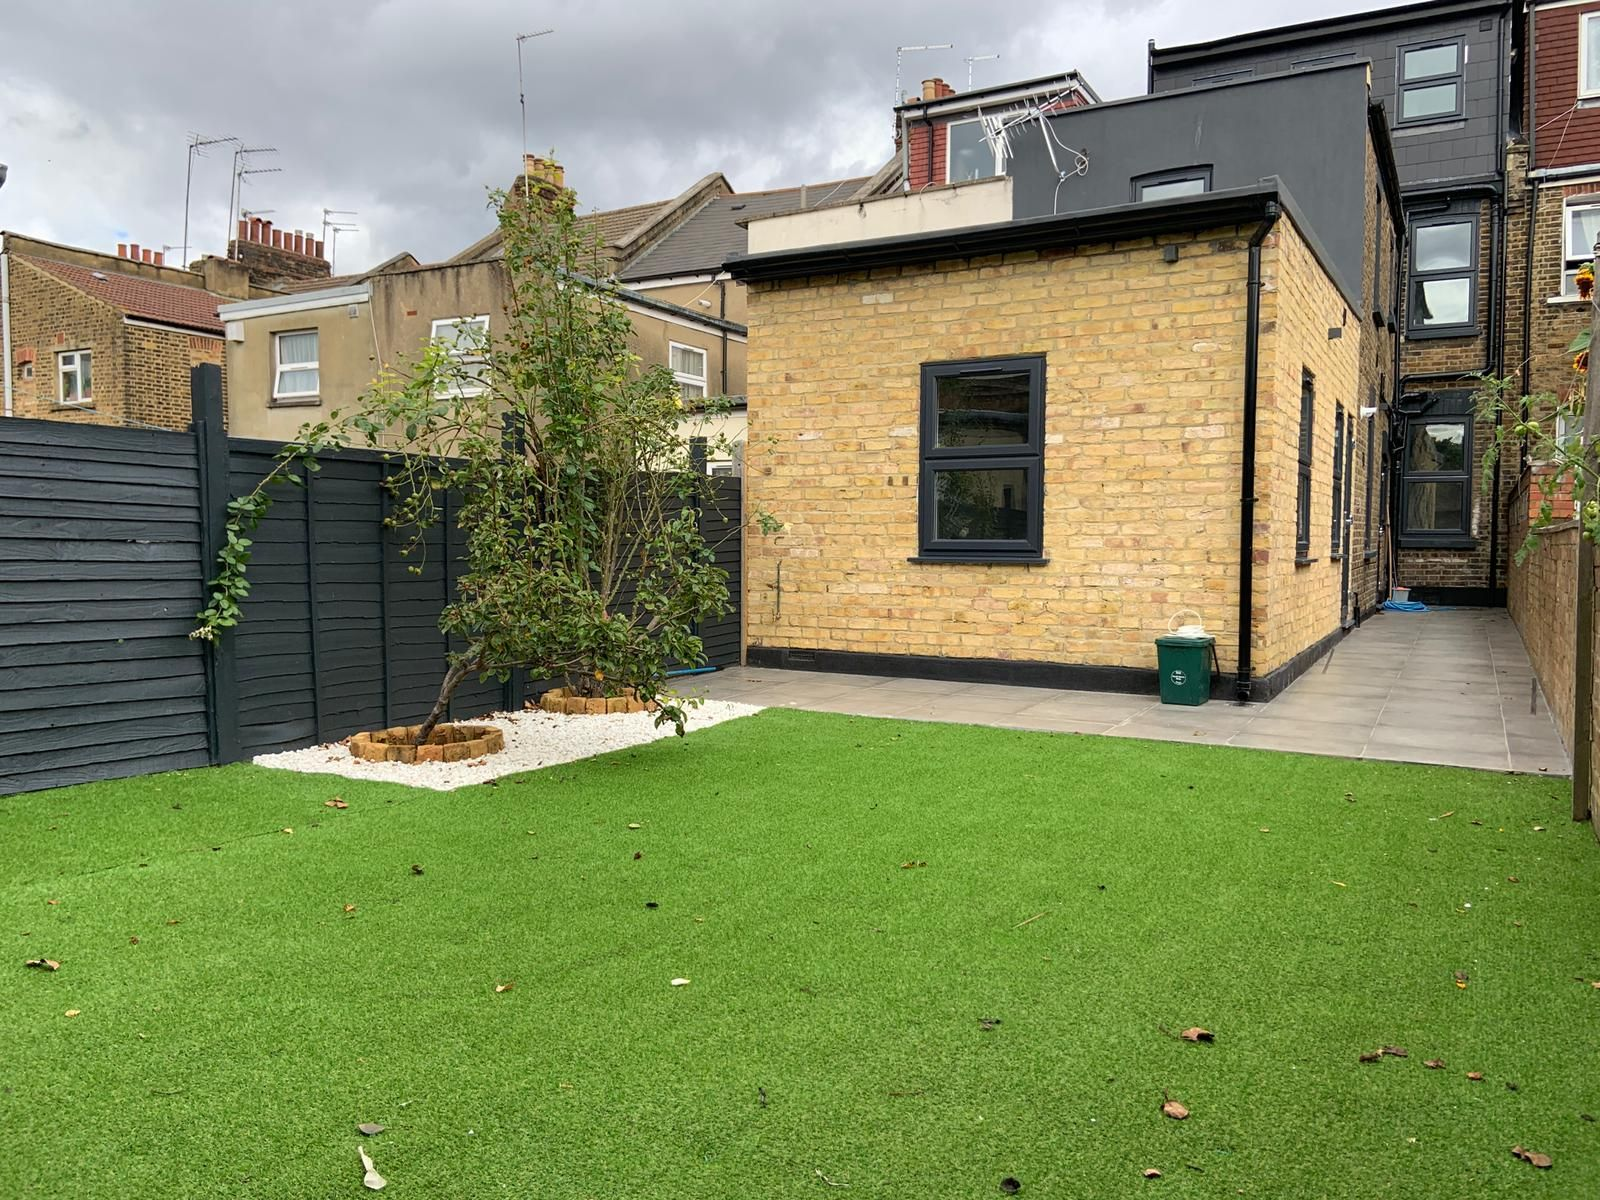 1 bedroom shared house Let in Dollis Hill - Communal Garden